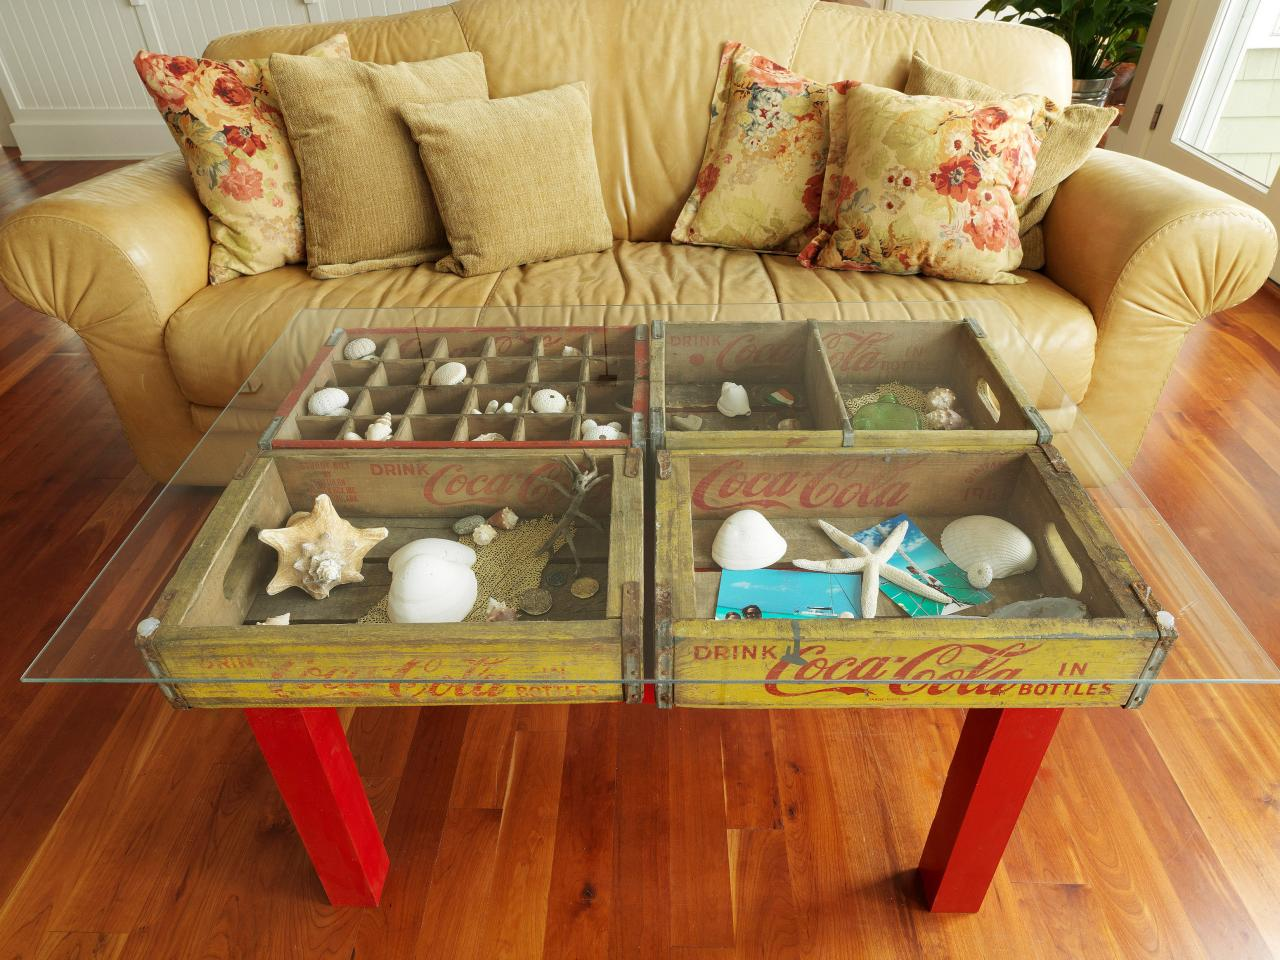 Ideas de decoraci n c mo reciclar muebles viejos para for Reciclar muebles viejos